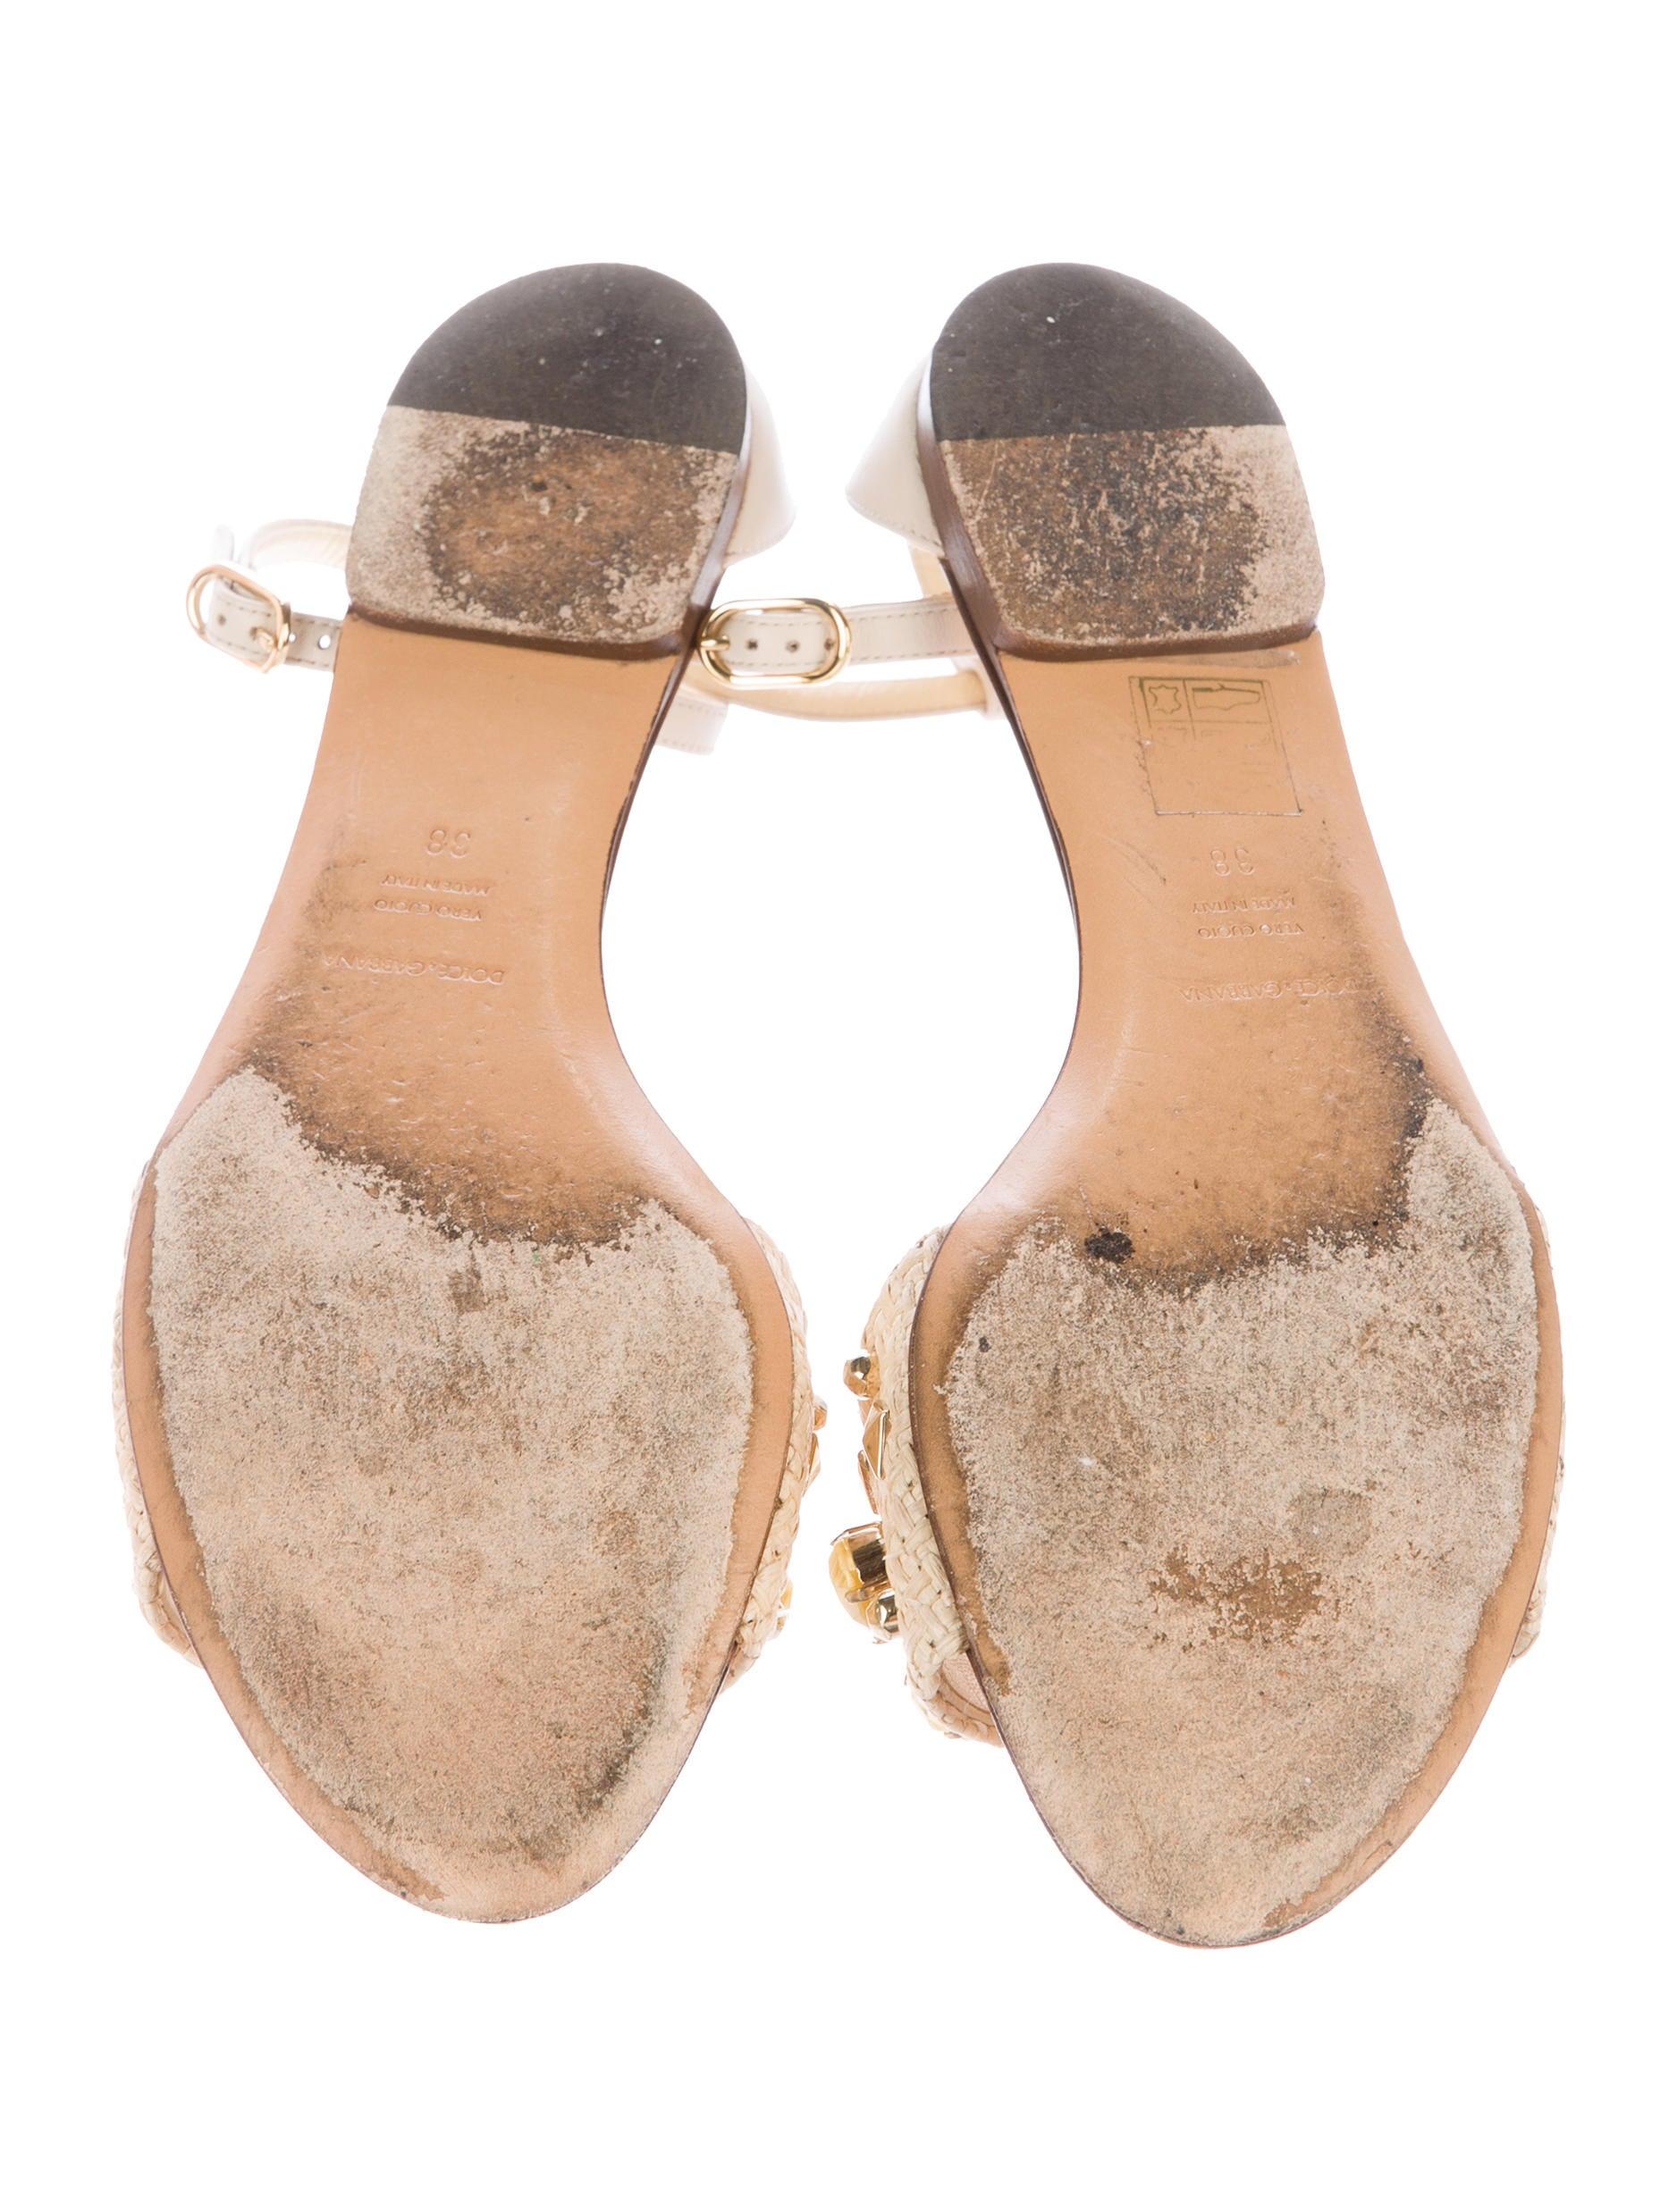 Dolce And Gabbana Sandals 28 Images Dolce Gabbana